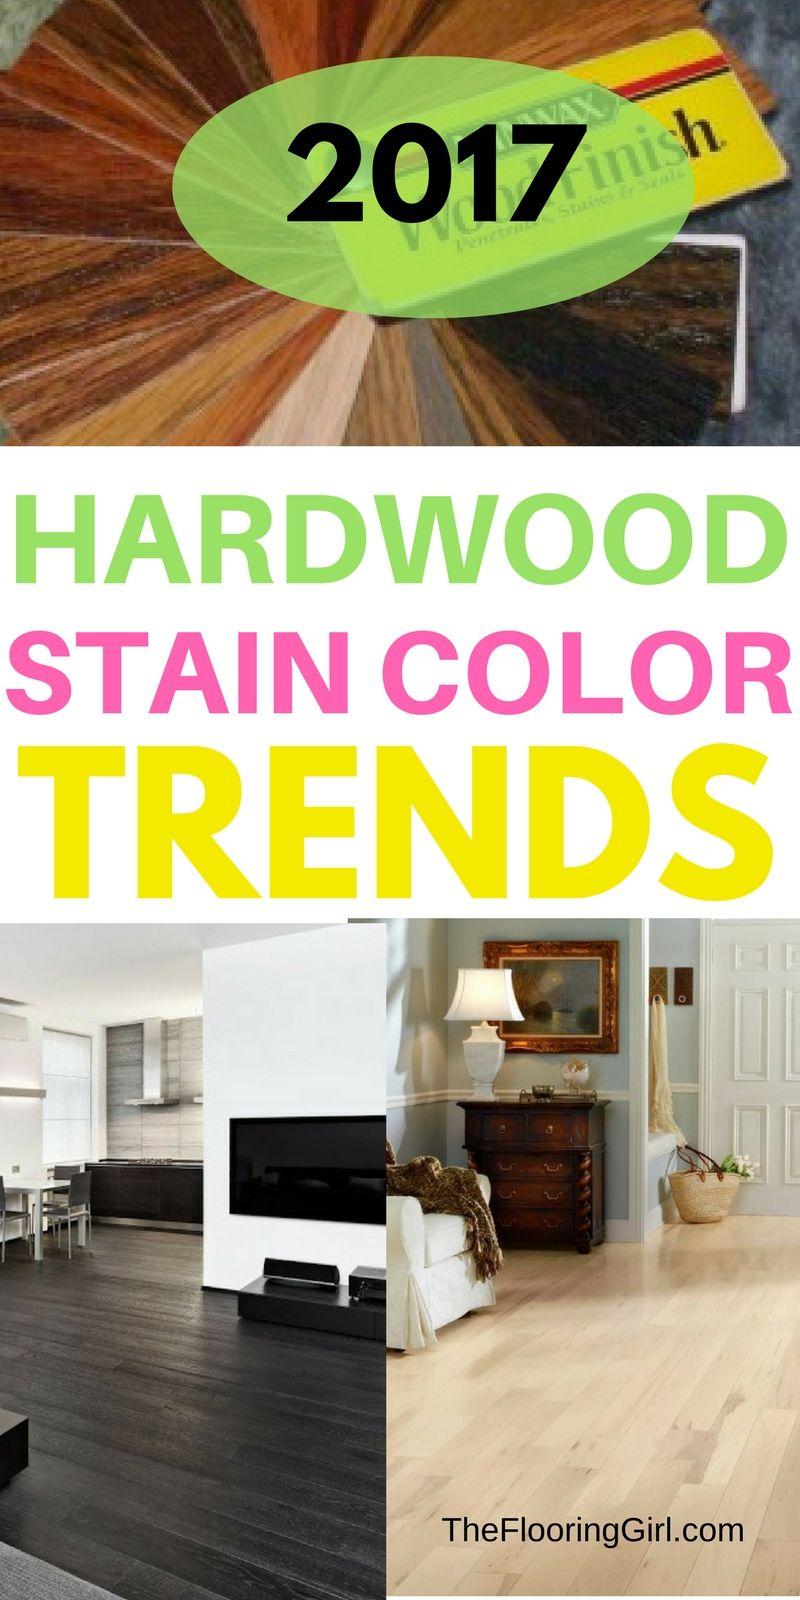 hardwood flooring stain color trends | refinish hardwood floors